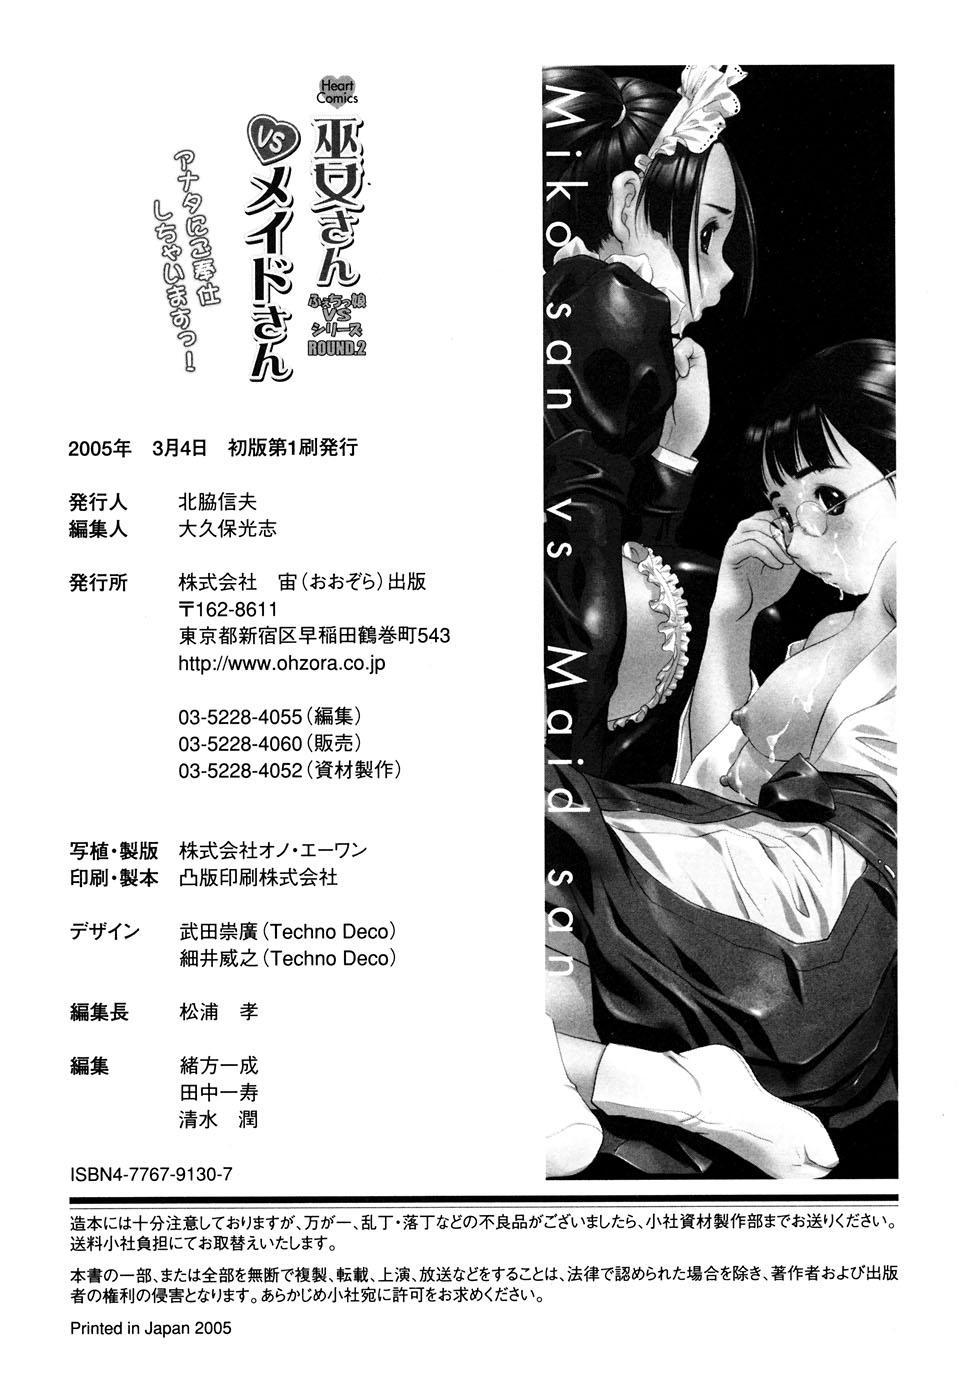 Fechikko VS Series ROUND.2 Miko San VS Maid San 166